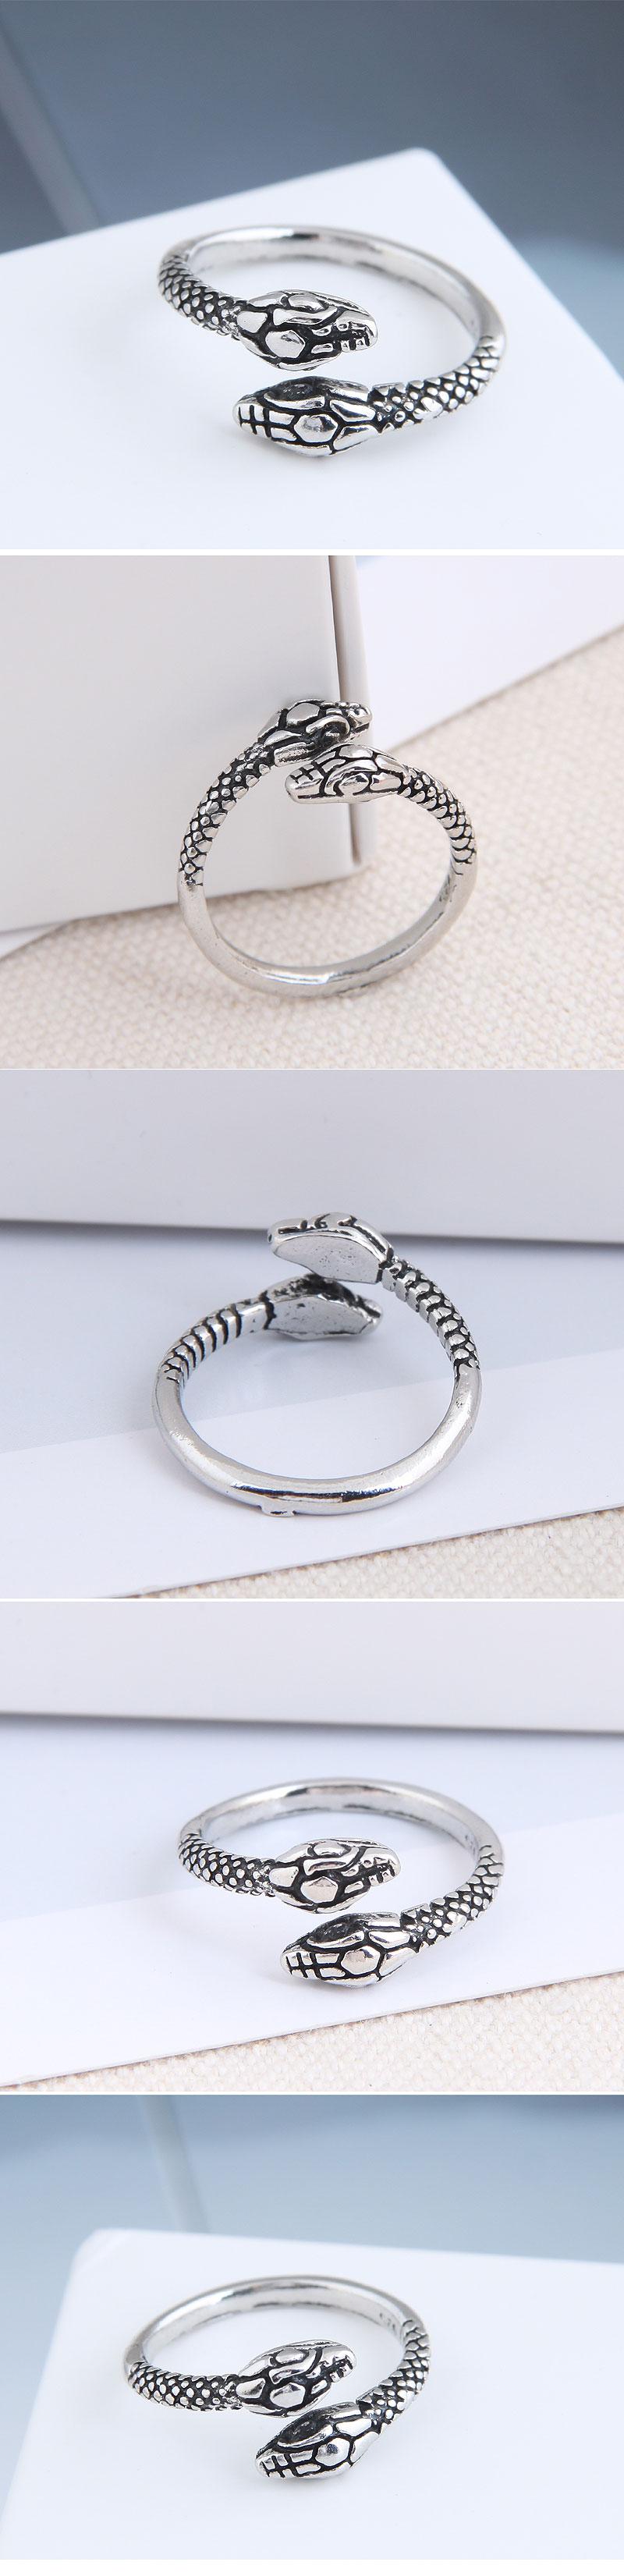 fashion metal snake open alloy ring hotsaling wholesale NHSC243290